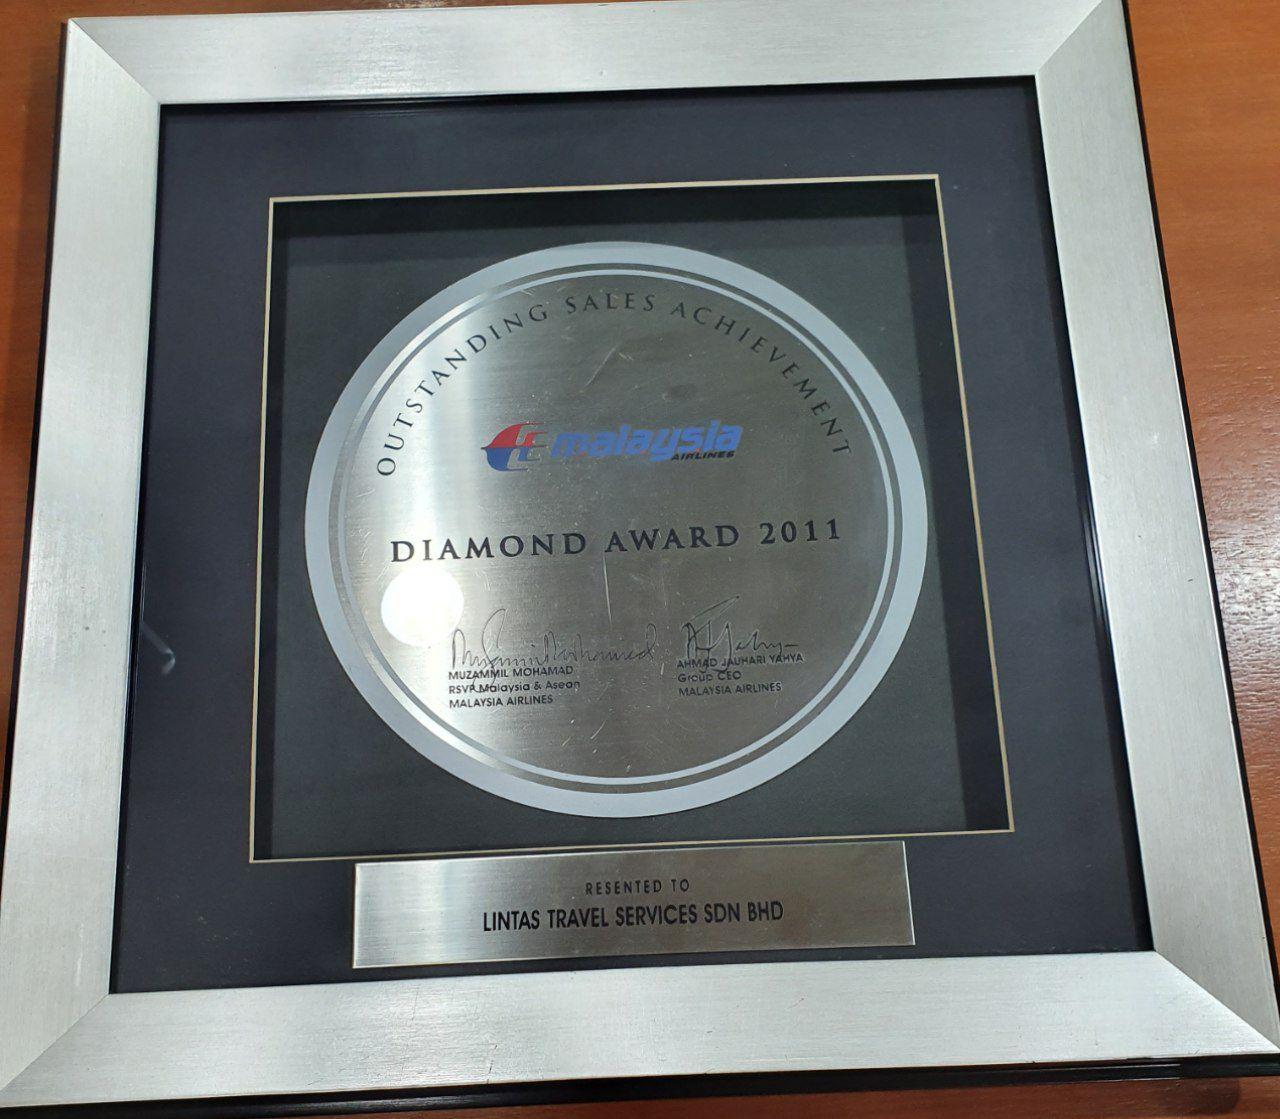 Malaysia Airlines Diamond Award